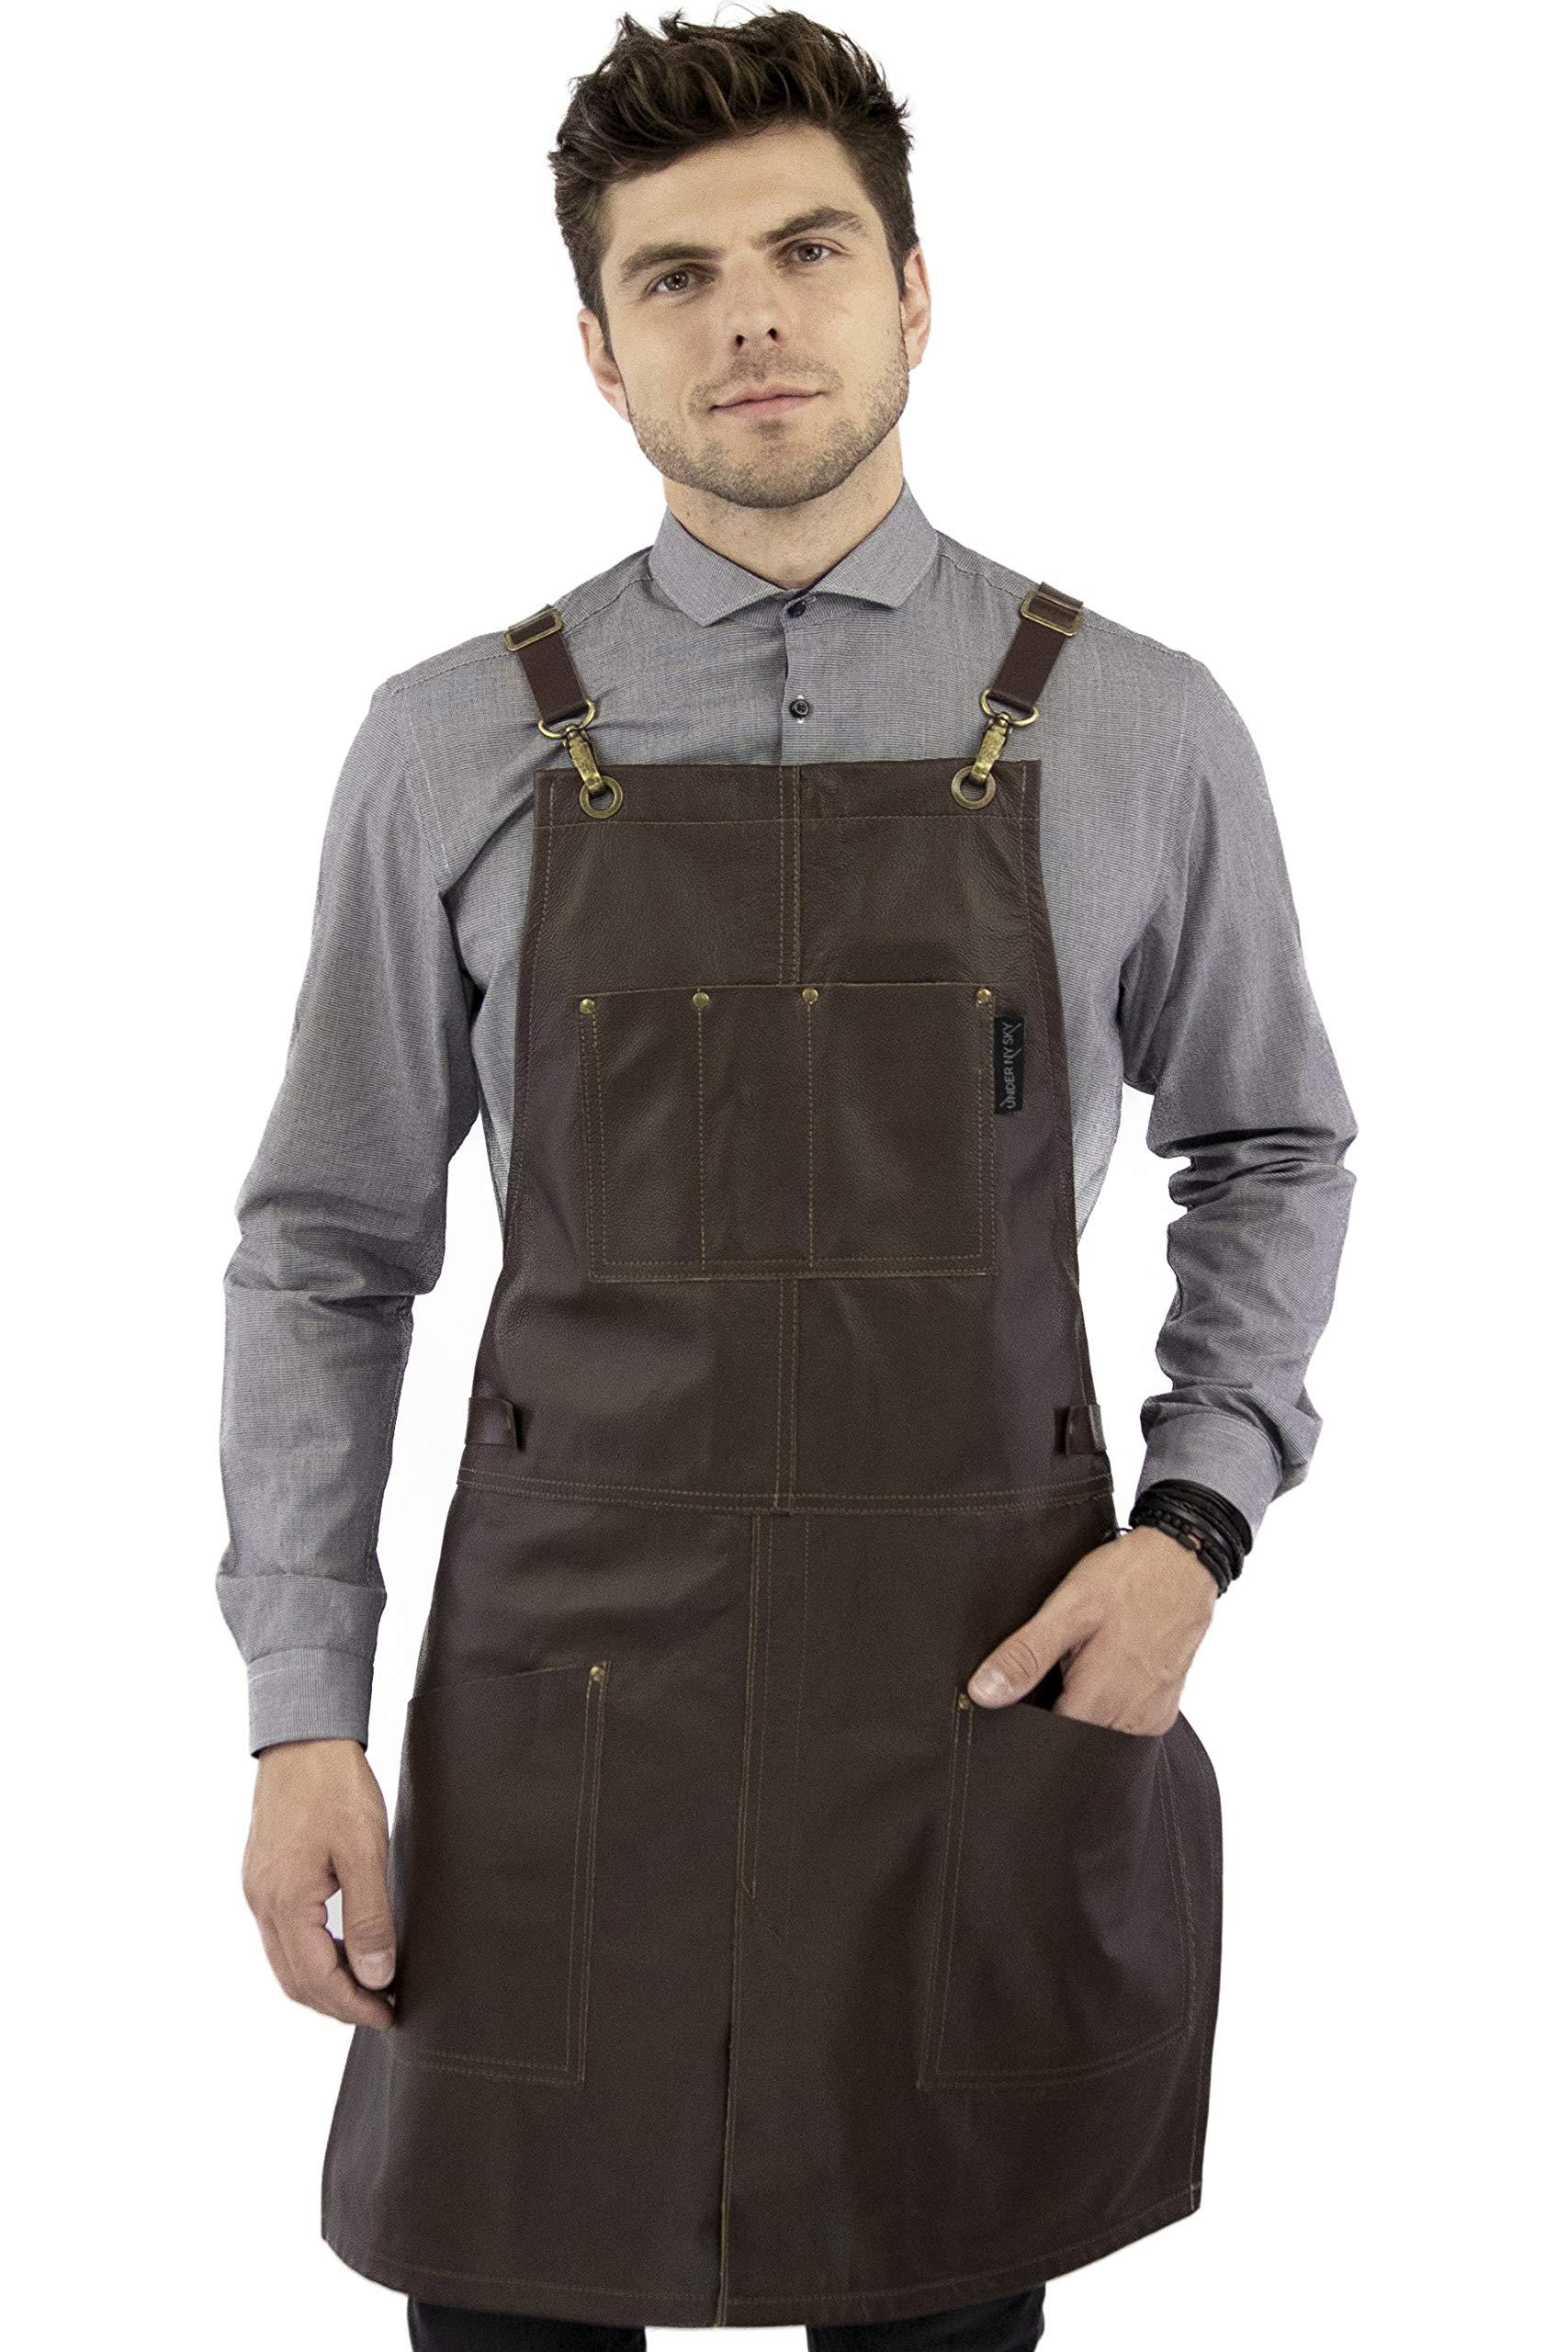 Under NY Sky Real Leather Apron - Brown Leather Body, Pockets and Crossback Straps - Split-Leg, Lined - Adjustable for Men and Women - Pro Chef, Barista, Barber, Woodworker, Shop, Bartender, Maker